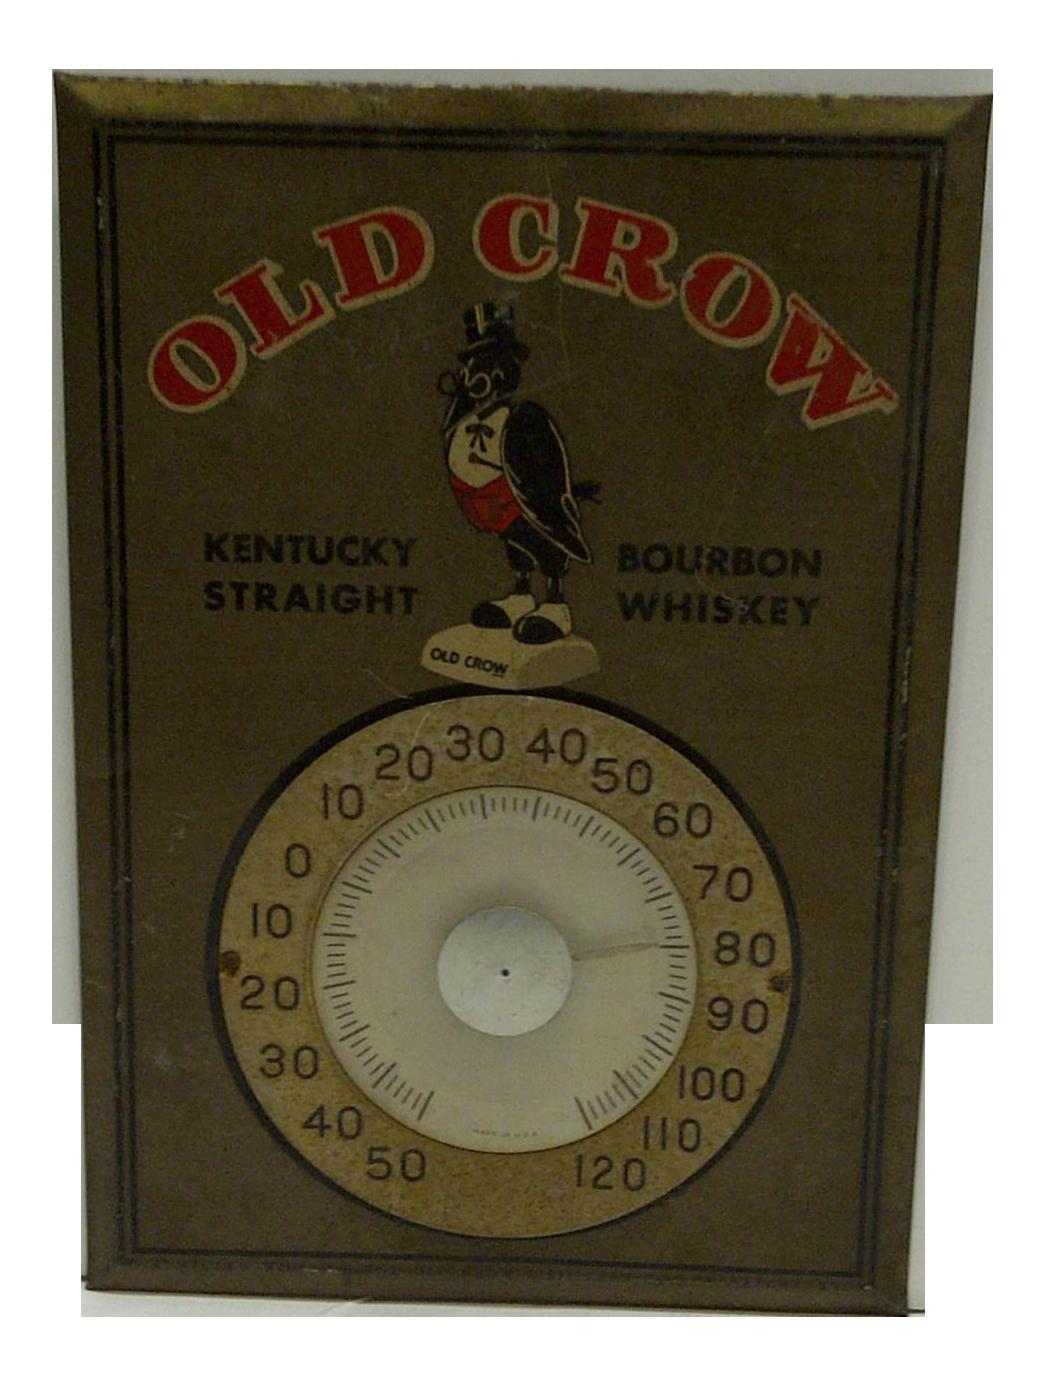 C 1950 Old Crow Kentucky Bourbon Whiskey Metal